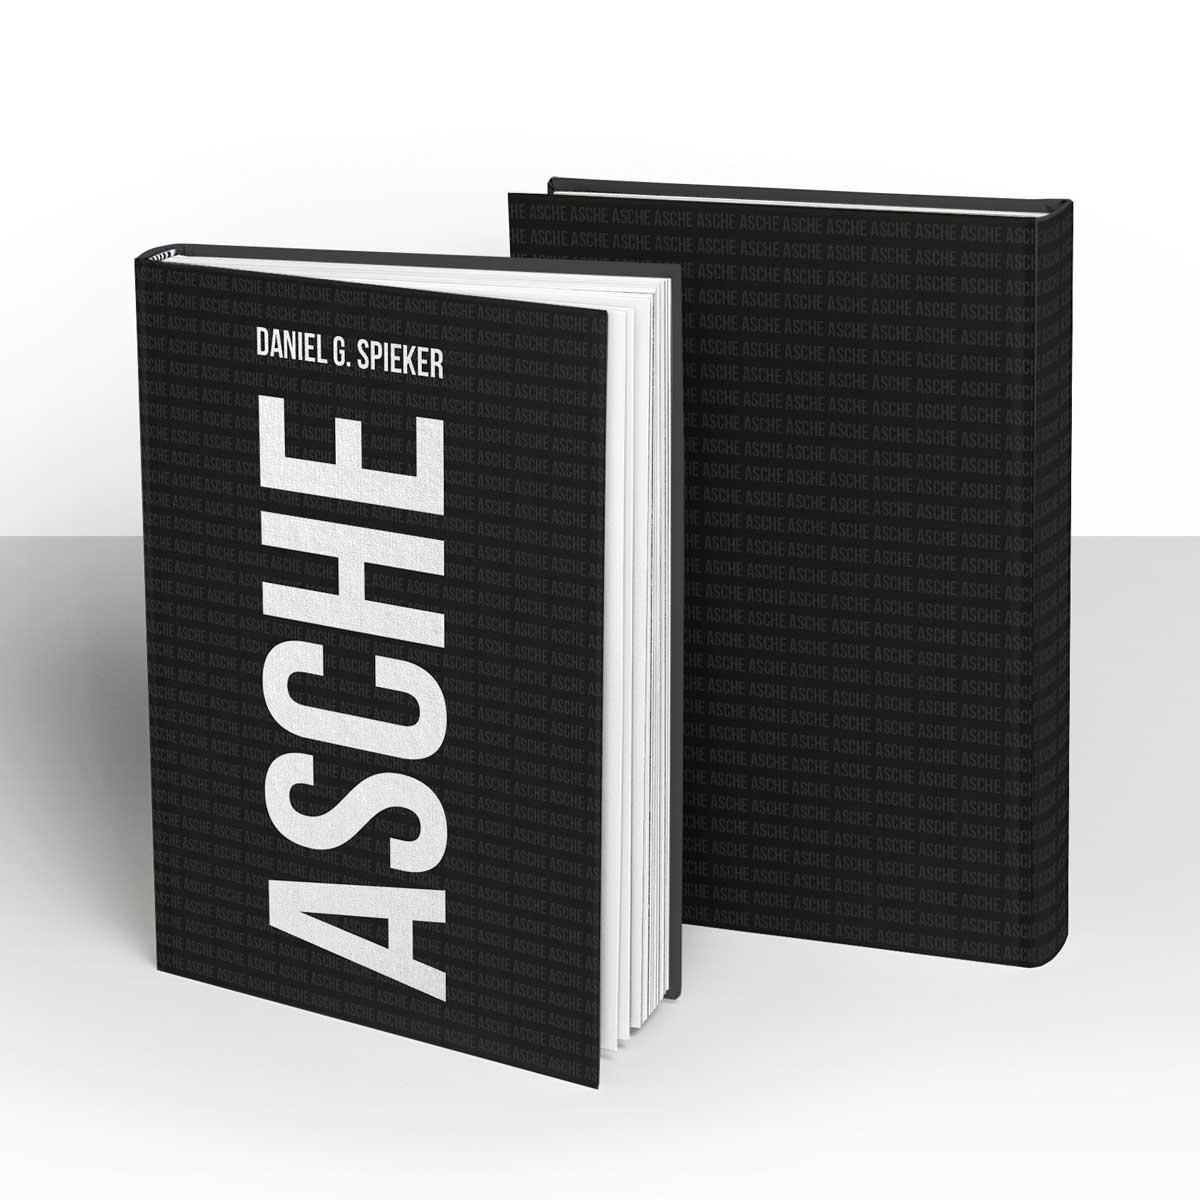 Asche Hardcover